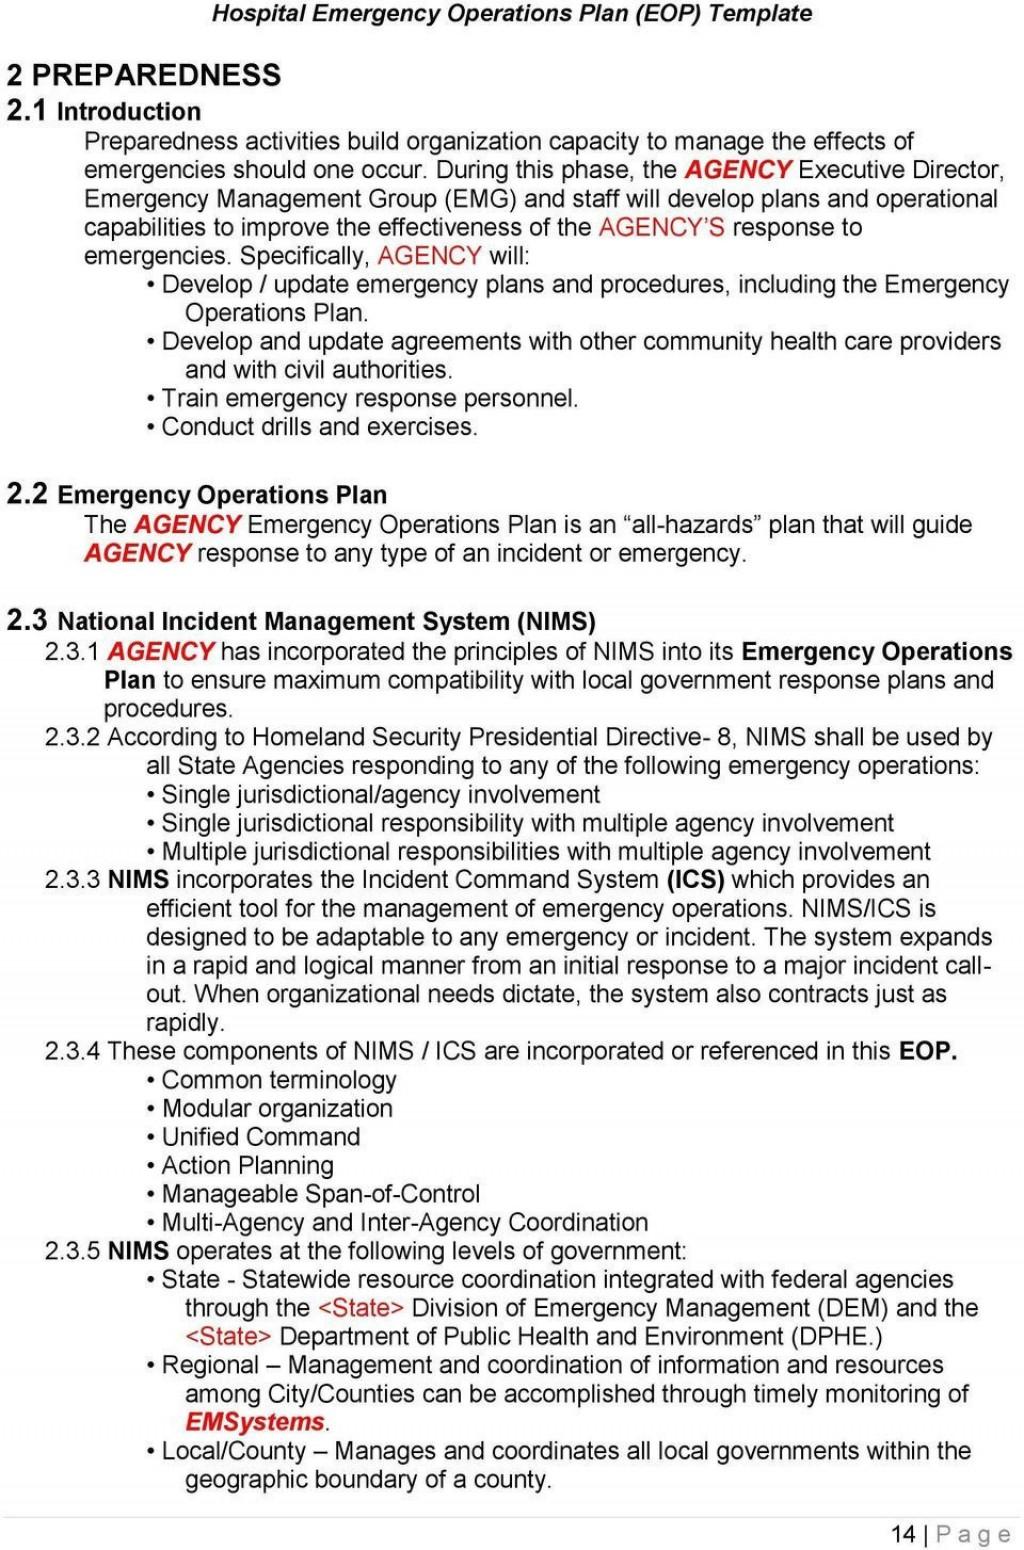 000 Sensational School Emergency Operation Plan Template Michigan High Resolution Large